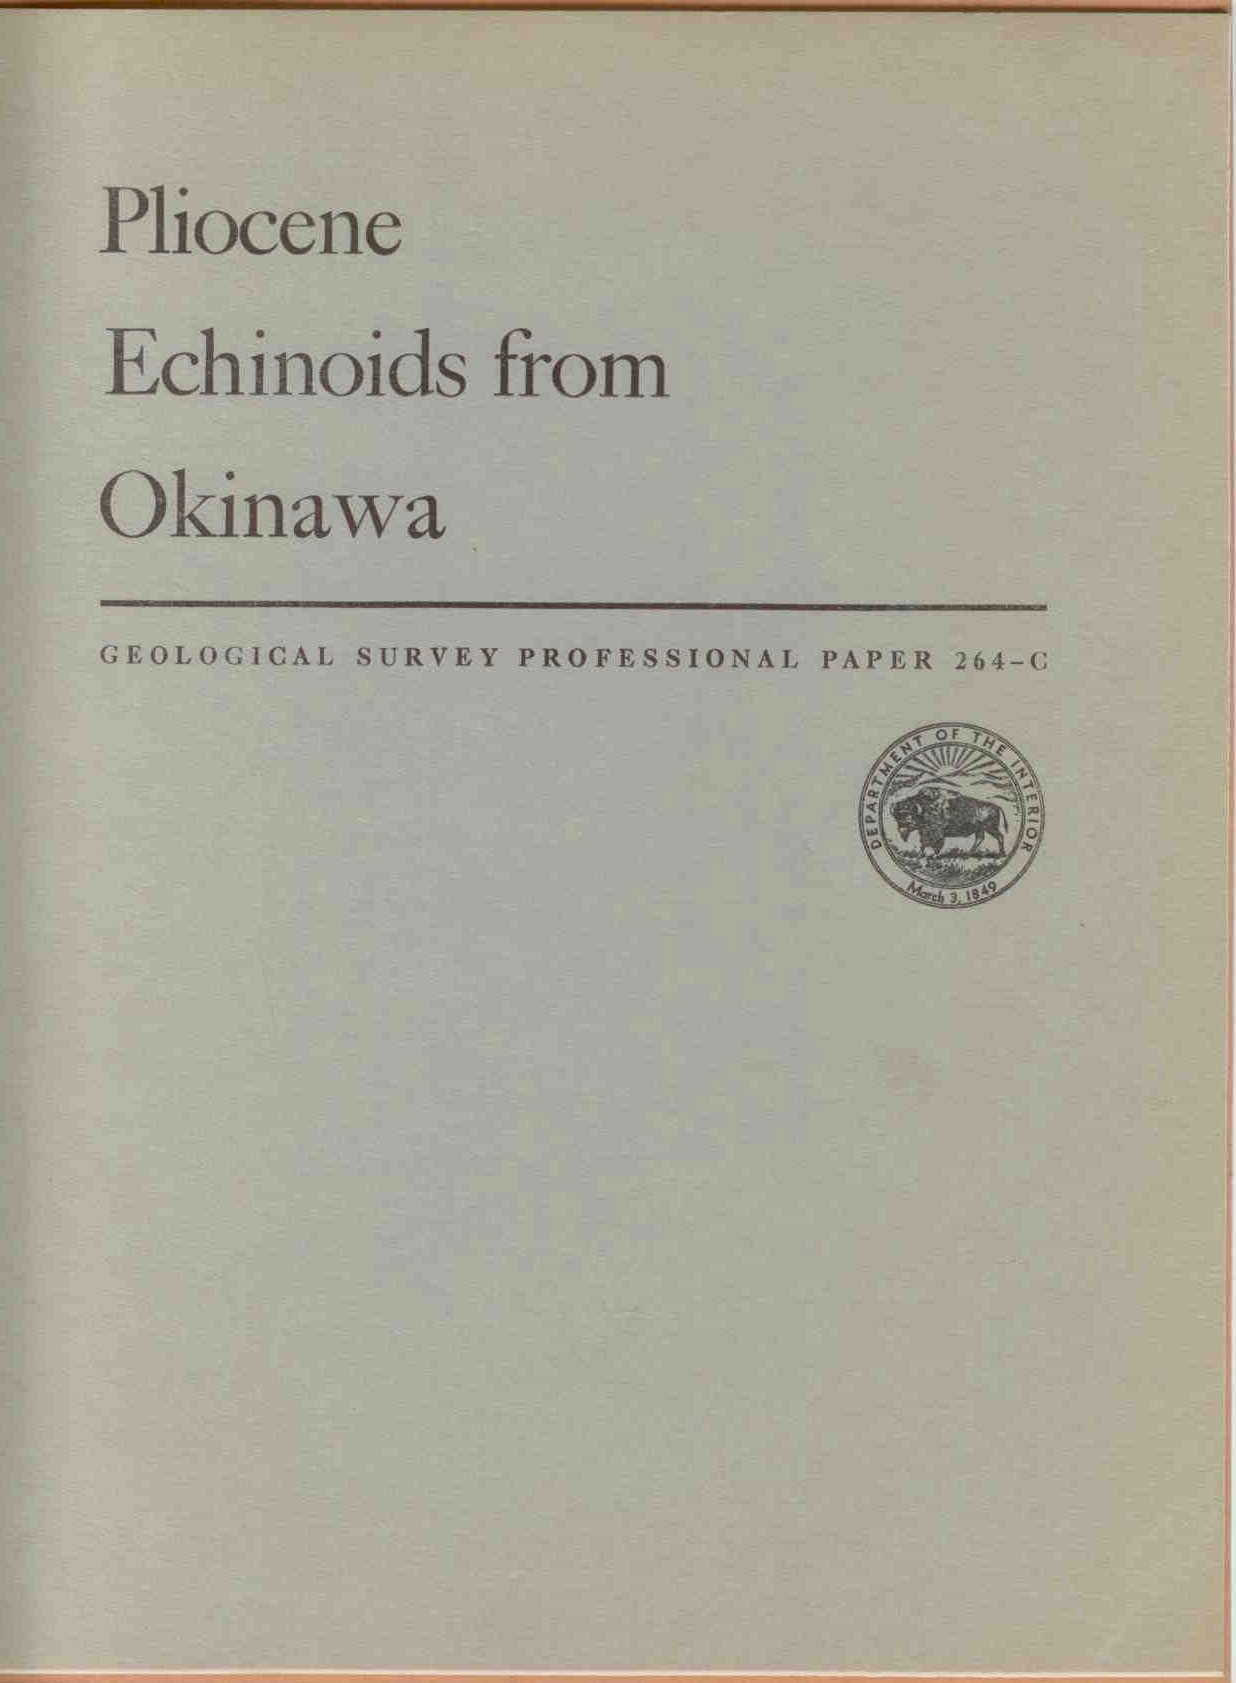 Cooke, W.: Pliocene Echinoids from Okinawa.